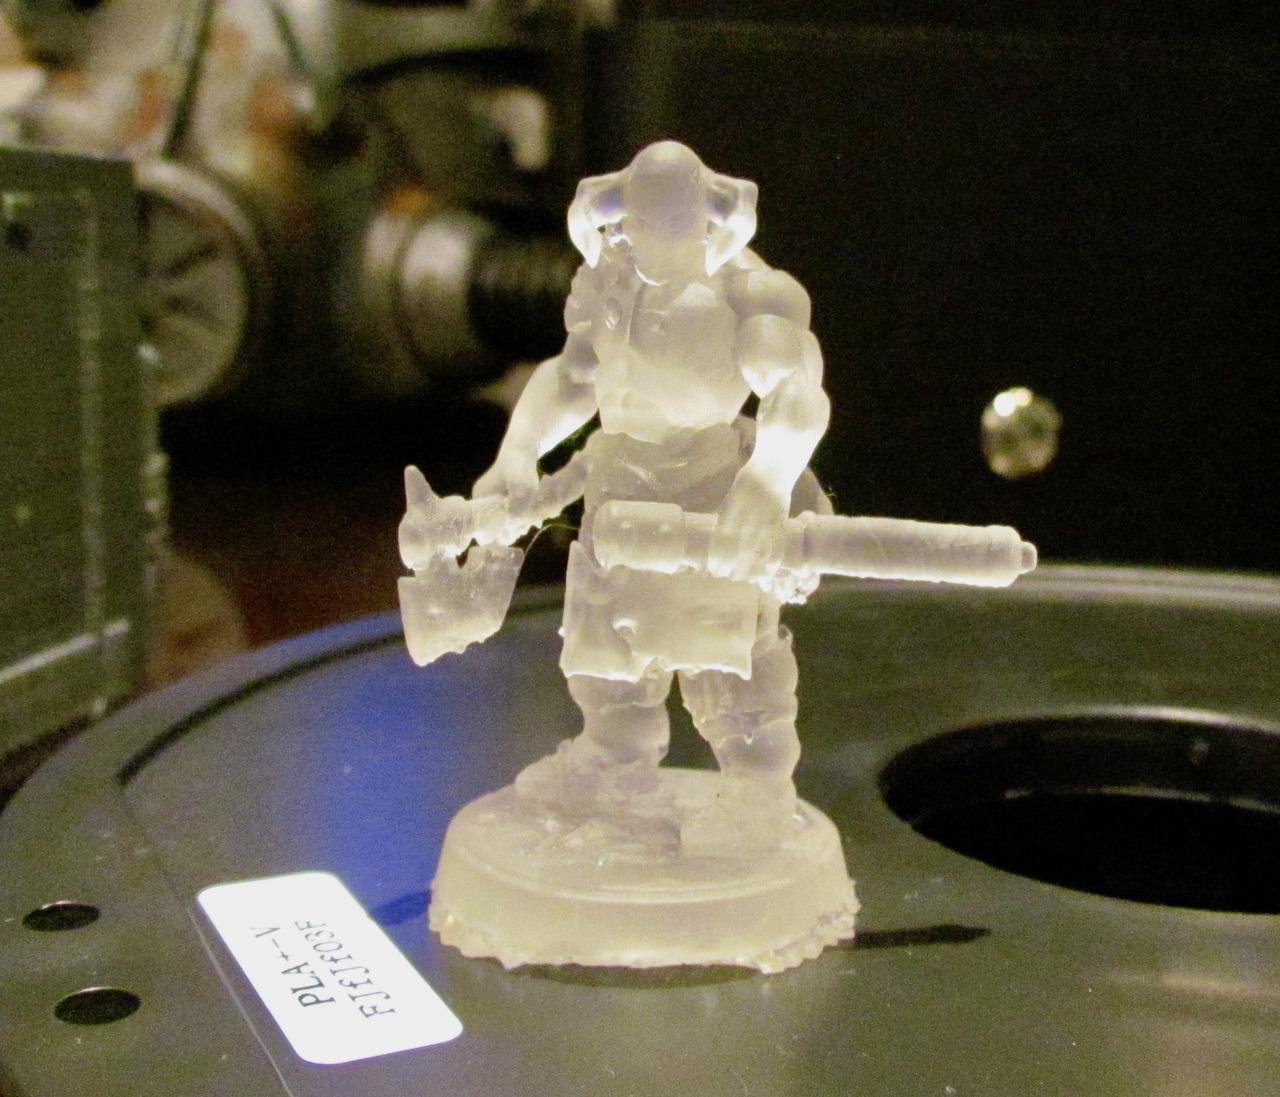 Monoprice Launching $149 Delta Mini Desktop 3D Printer, And